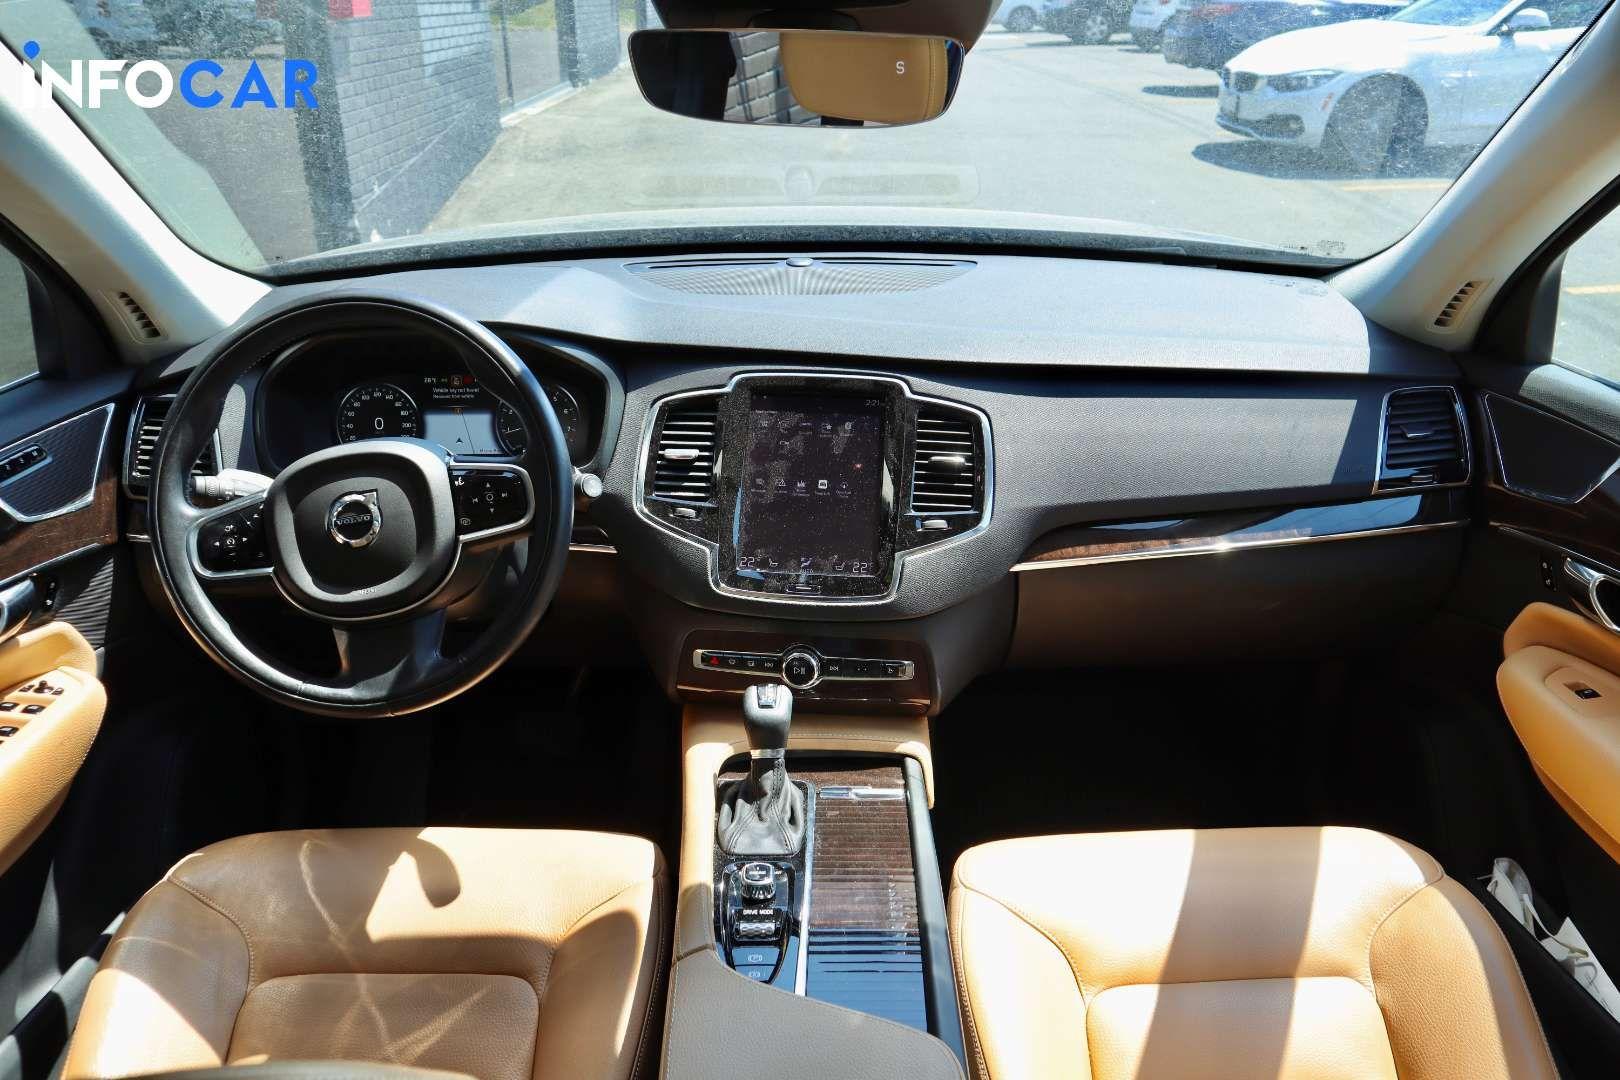 2016 Volvo XC90 T6 Momentum - INFOCAR - Toronto's Most Comprehensive New and Used Auto Trading Platform